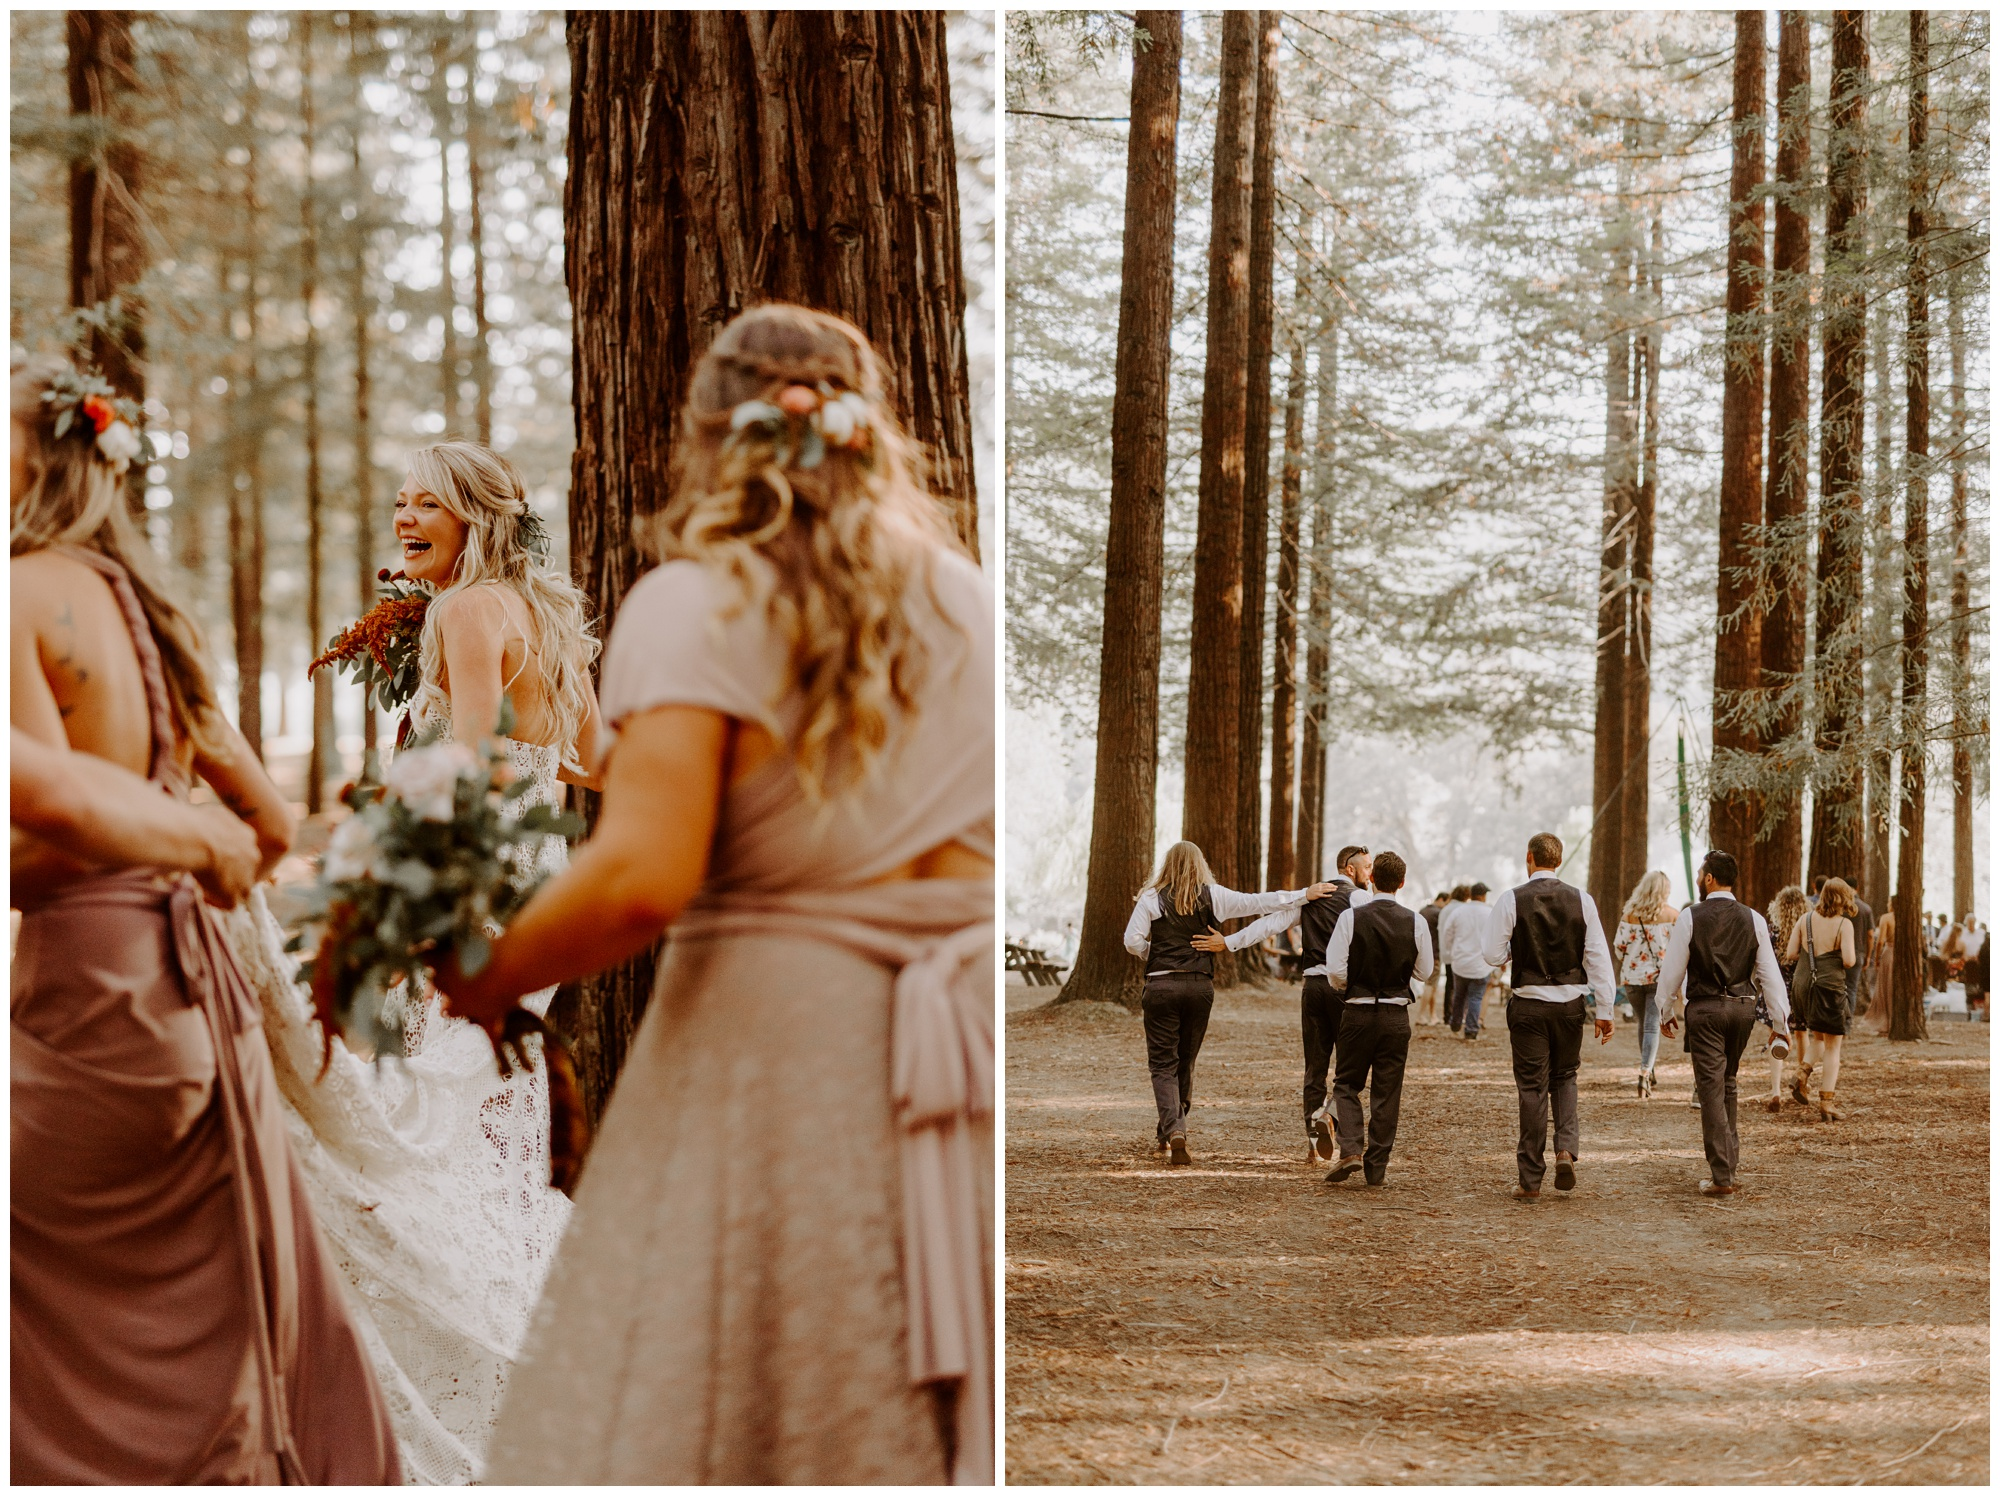 Redwood Festival Wedding Humbolt California - Jessica Heron Images_0044.jpg